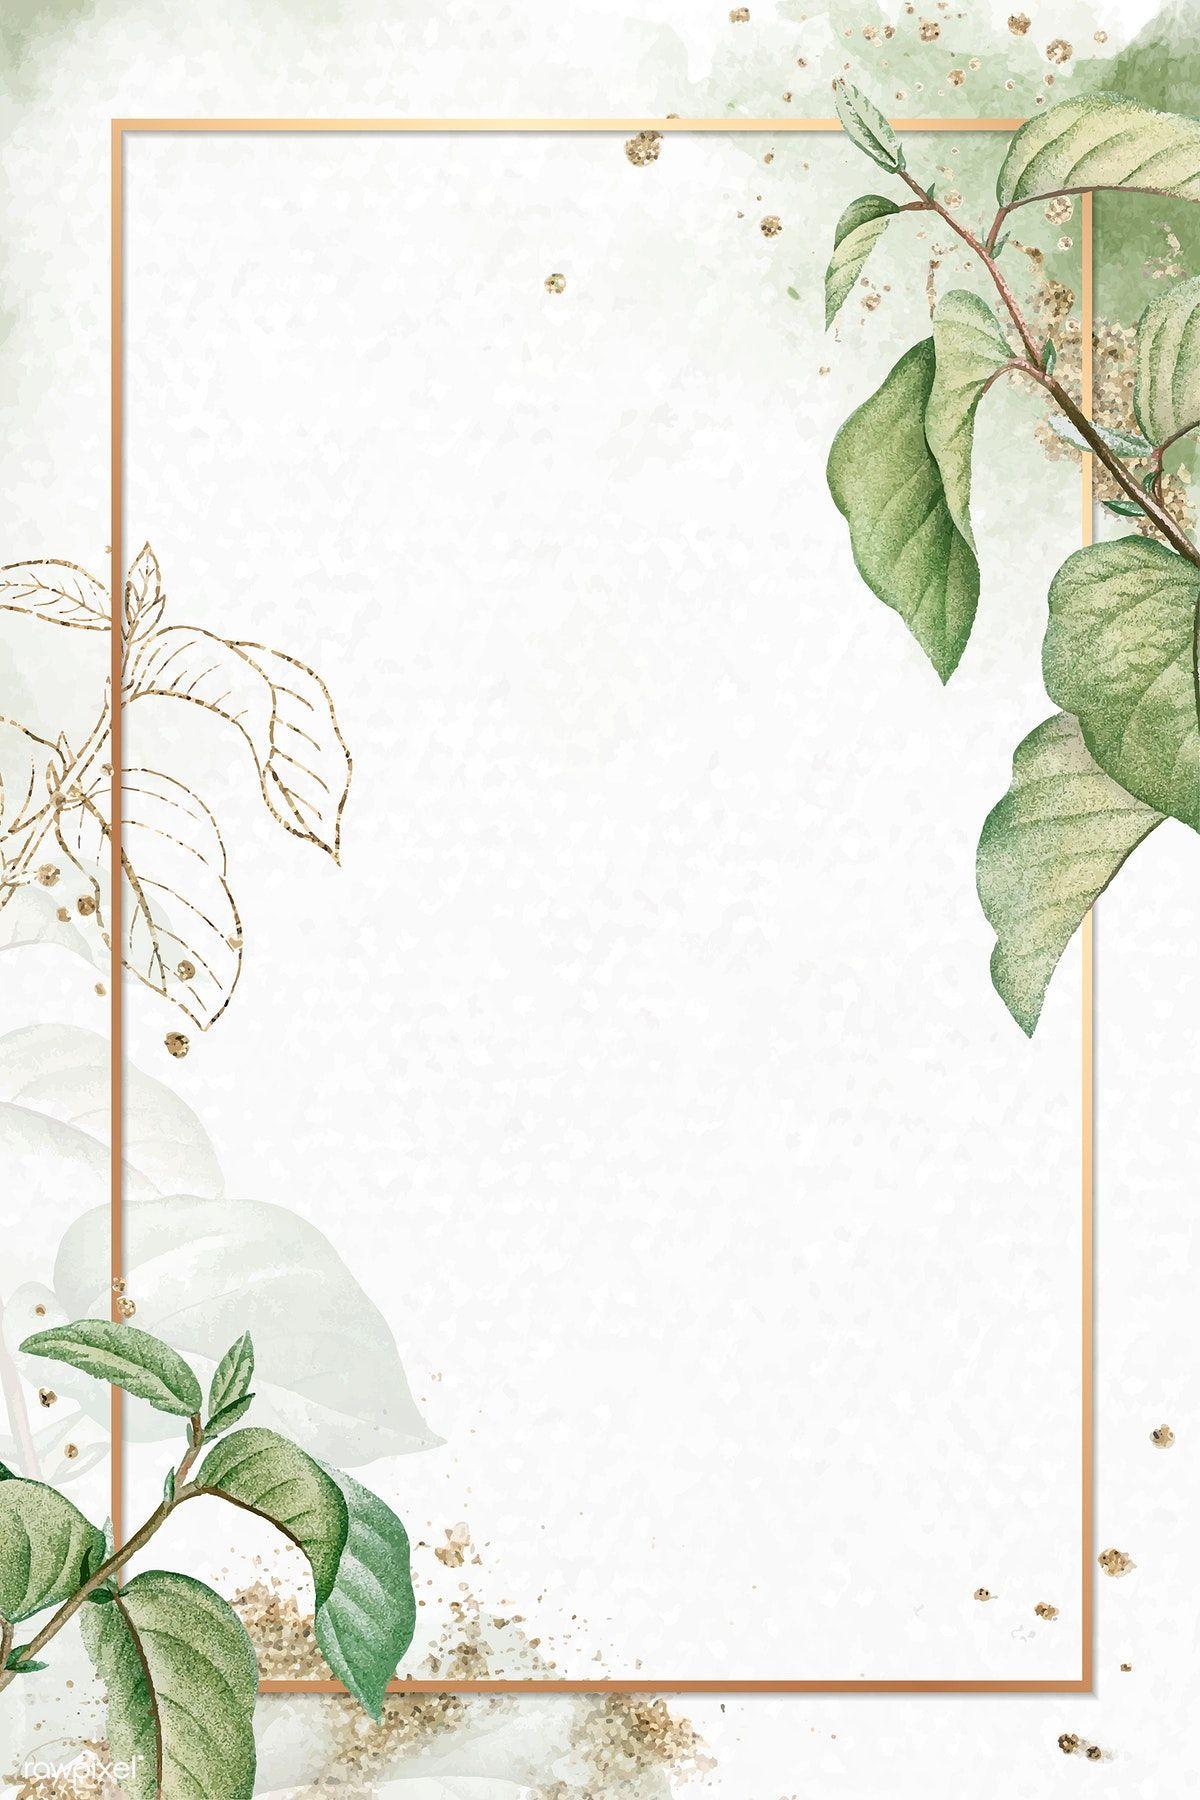 Download premium vector of Gold frame on briançon apricot ...